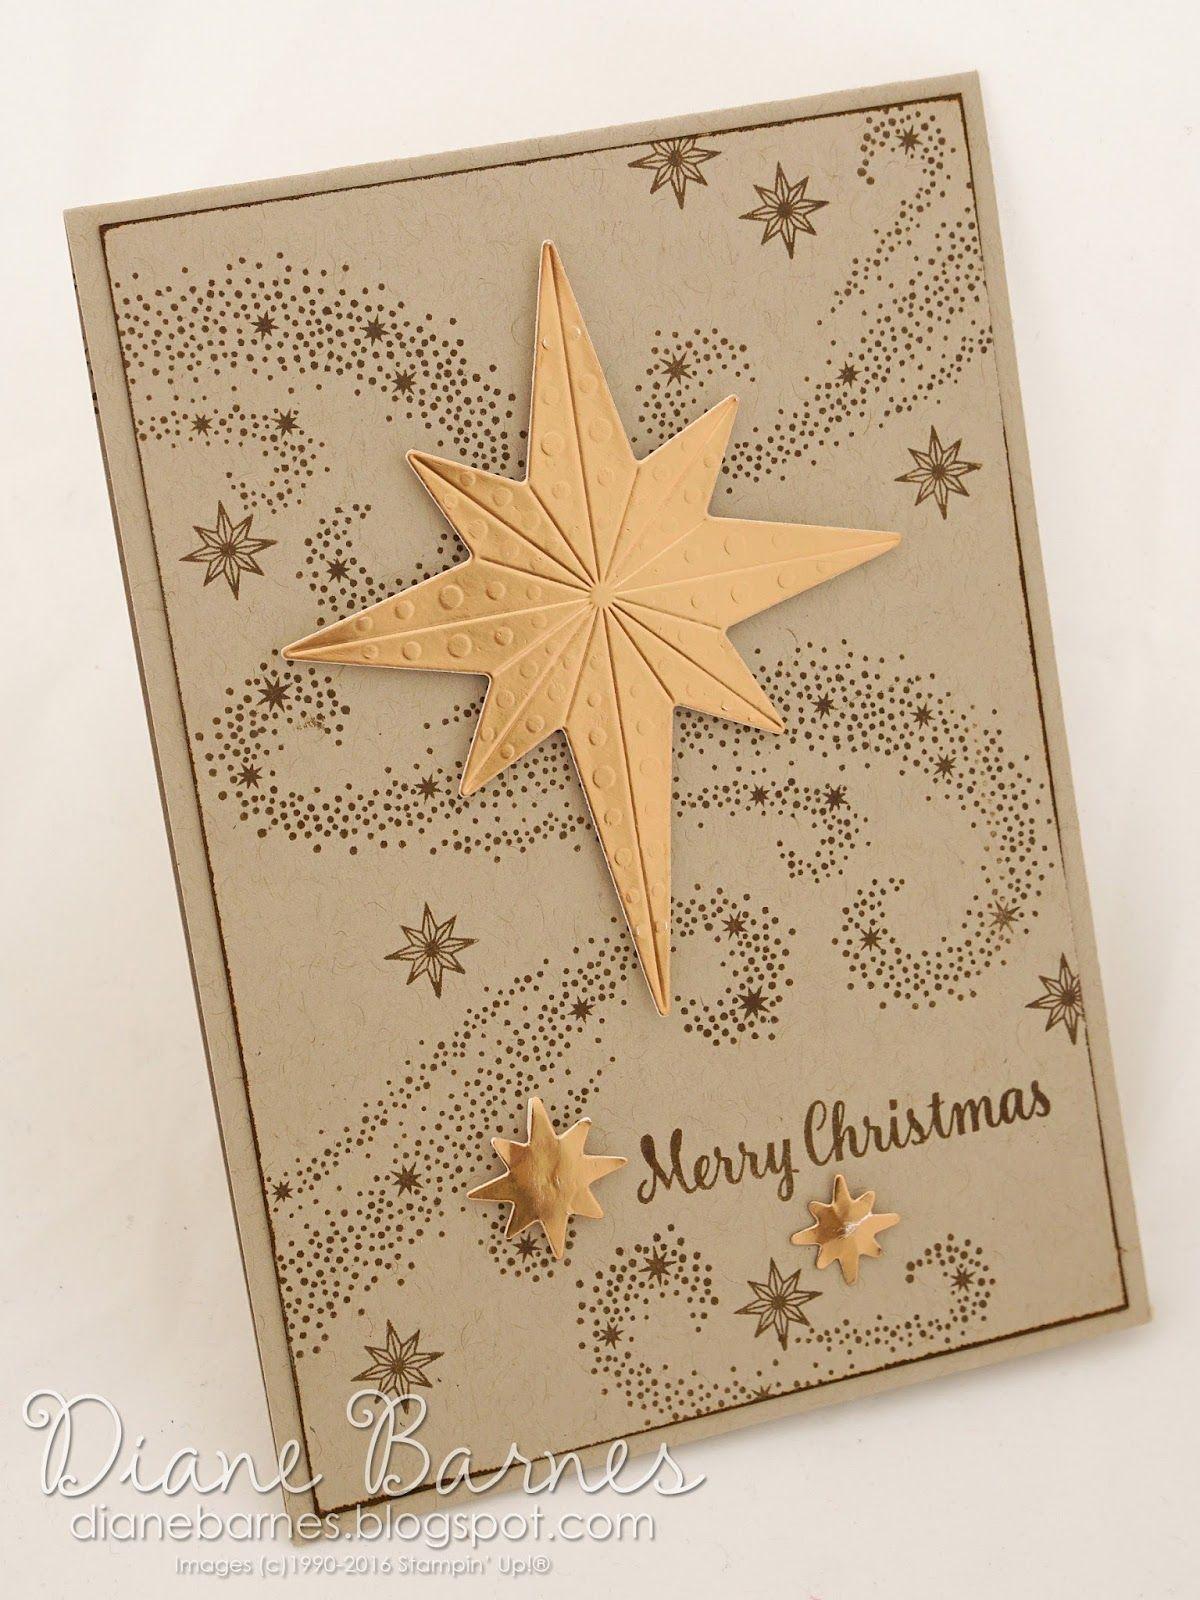 Christmas Star of Light 1 - so simple